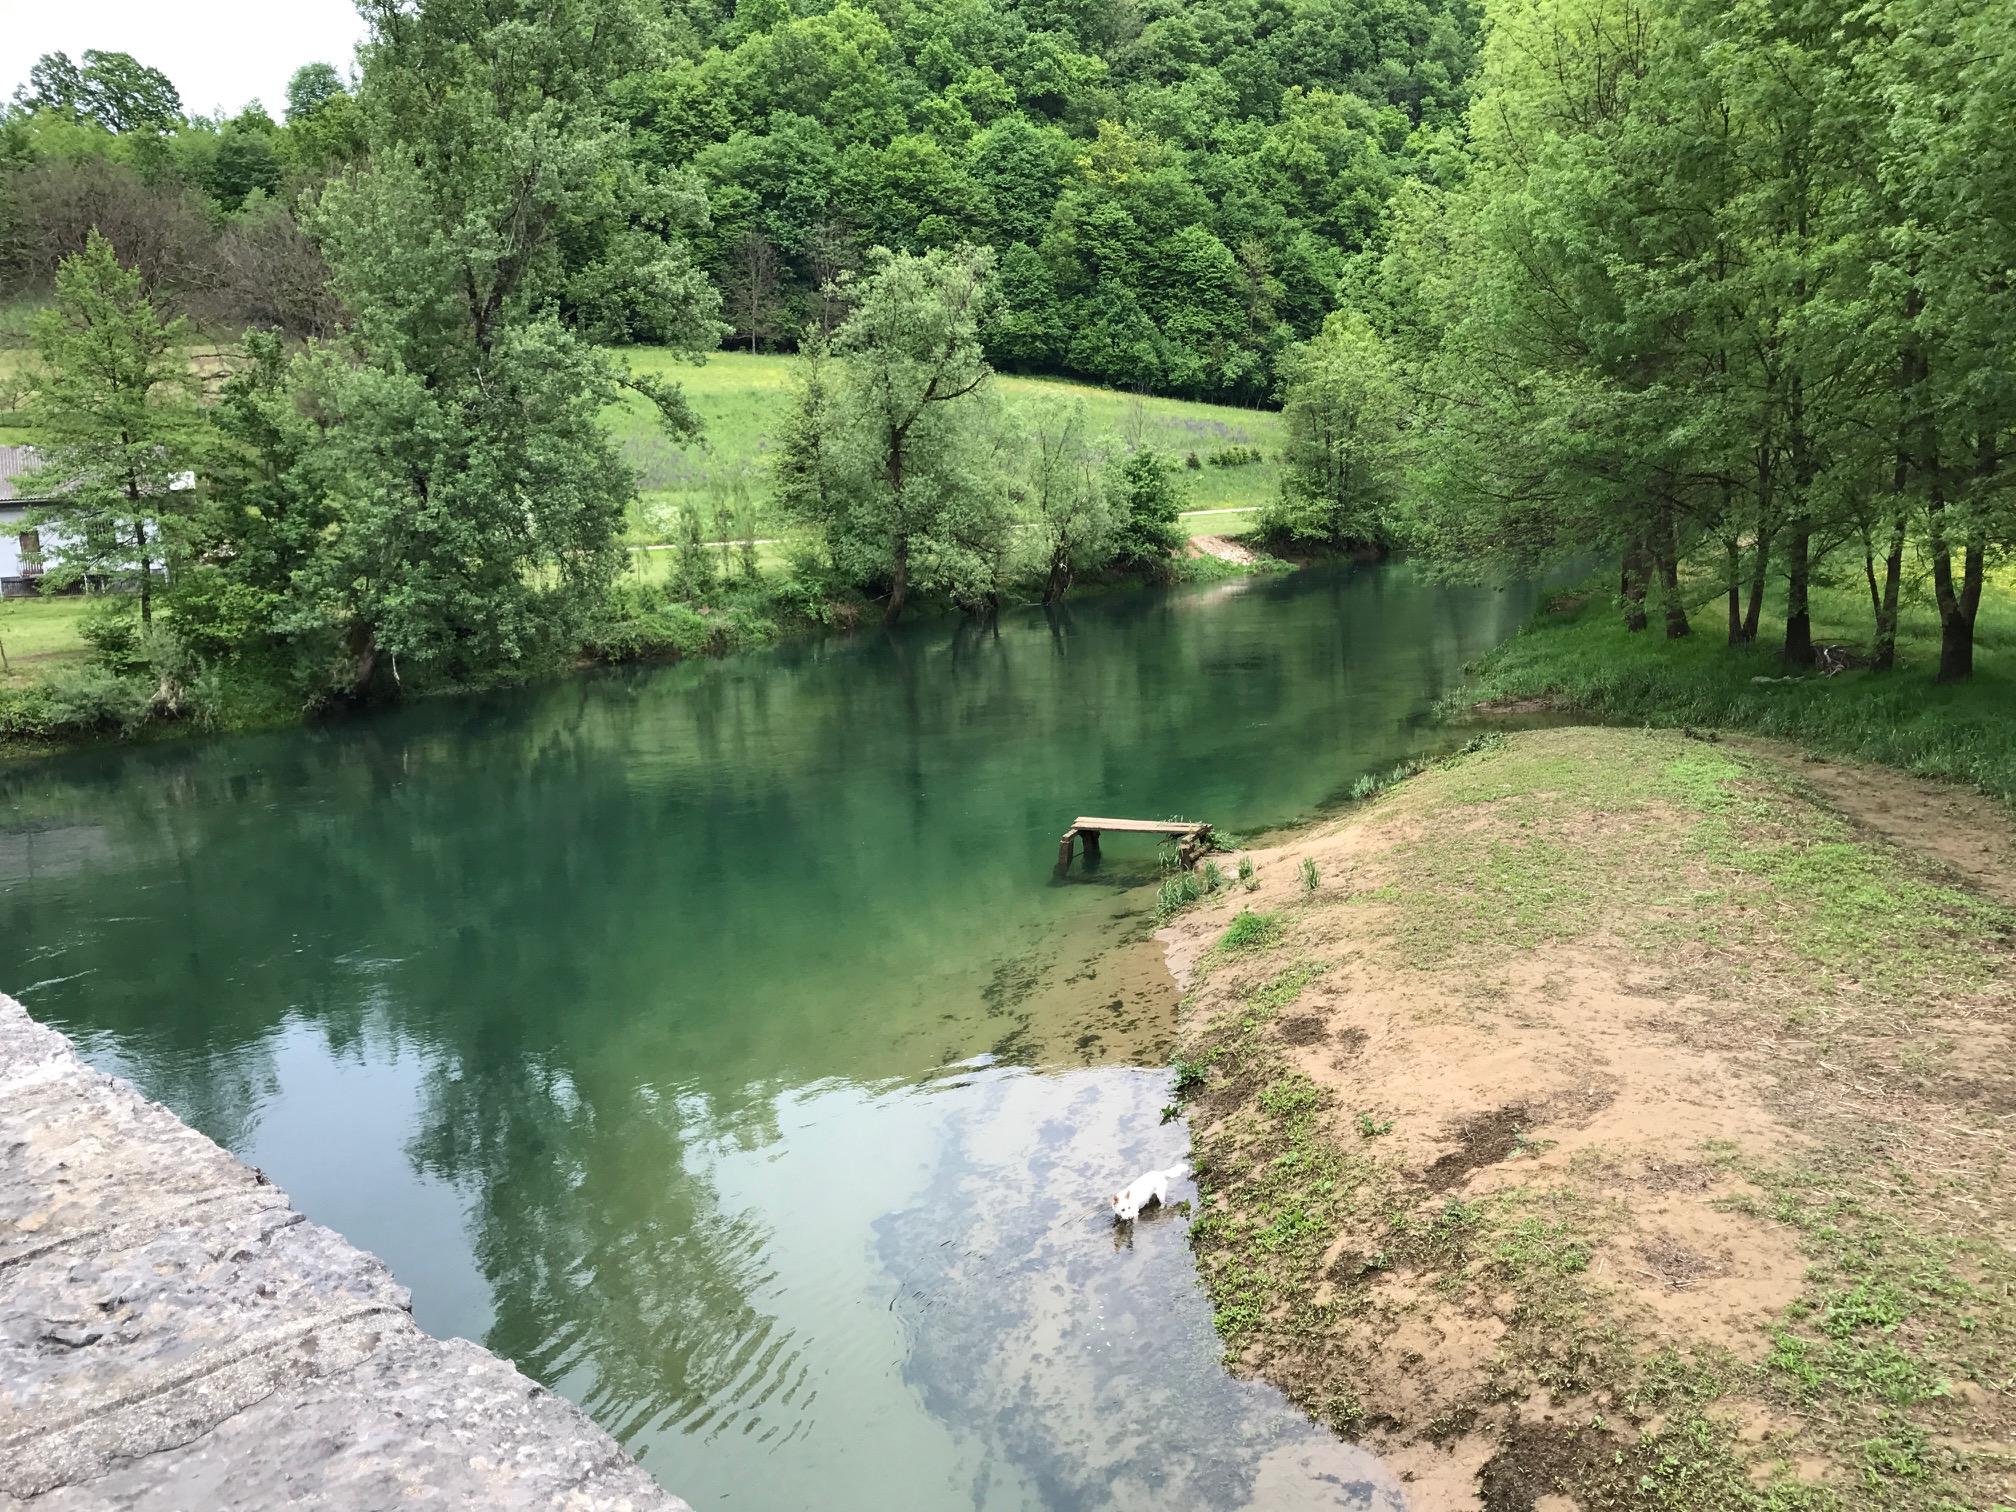 The Dobra River near Sara's family's home.